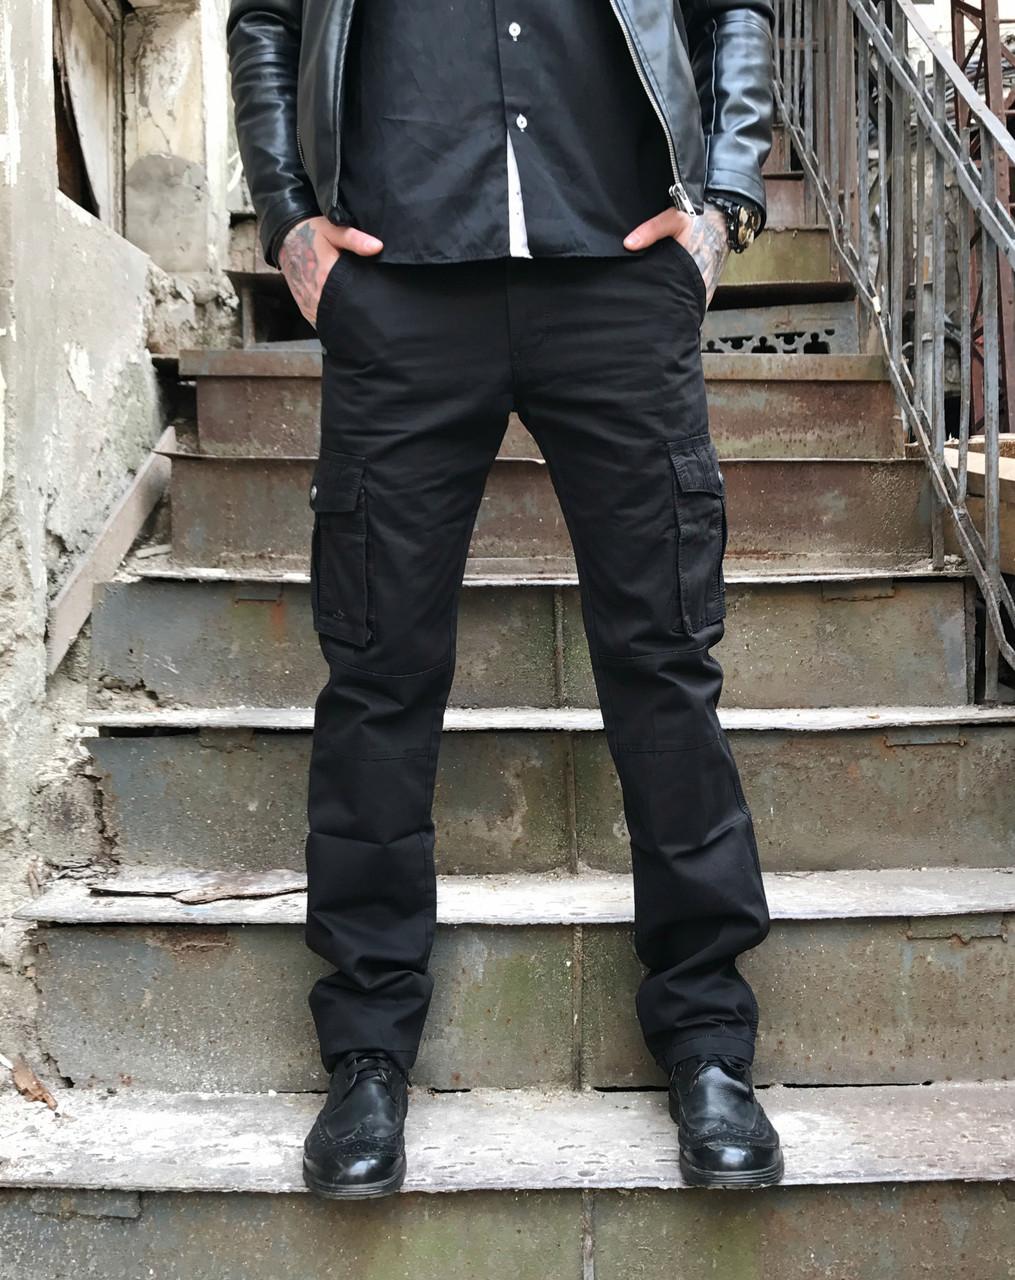 Джинсы карго карманы мужские (черные Iteno)